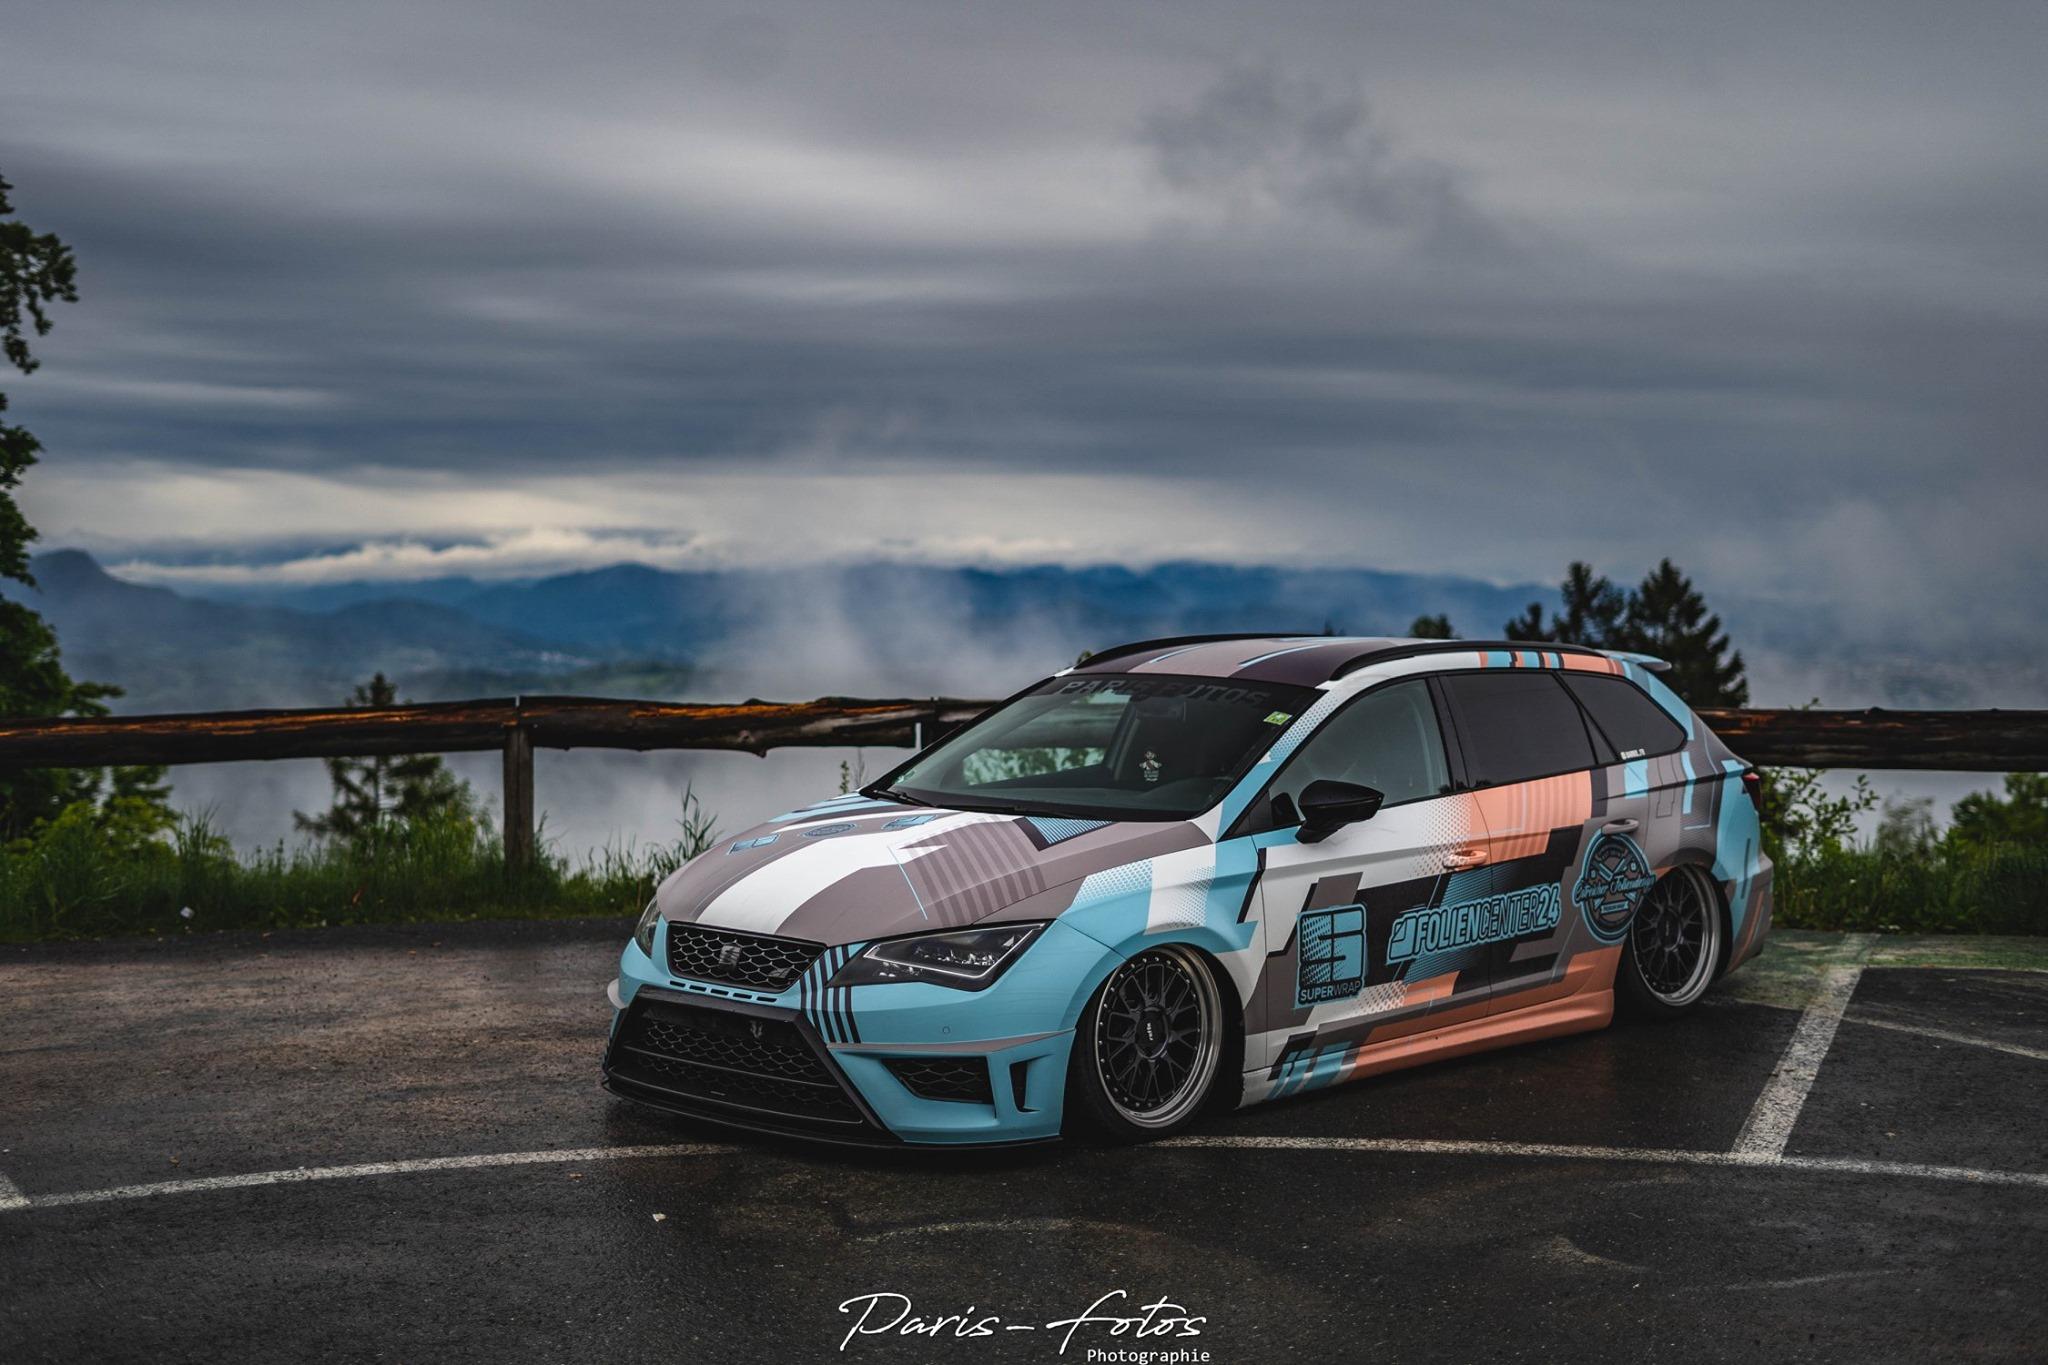 Seat-Leon-Cupra-FR-by-Yagodesign-2019-Pastels-3